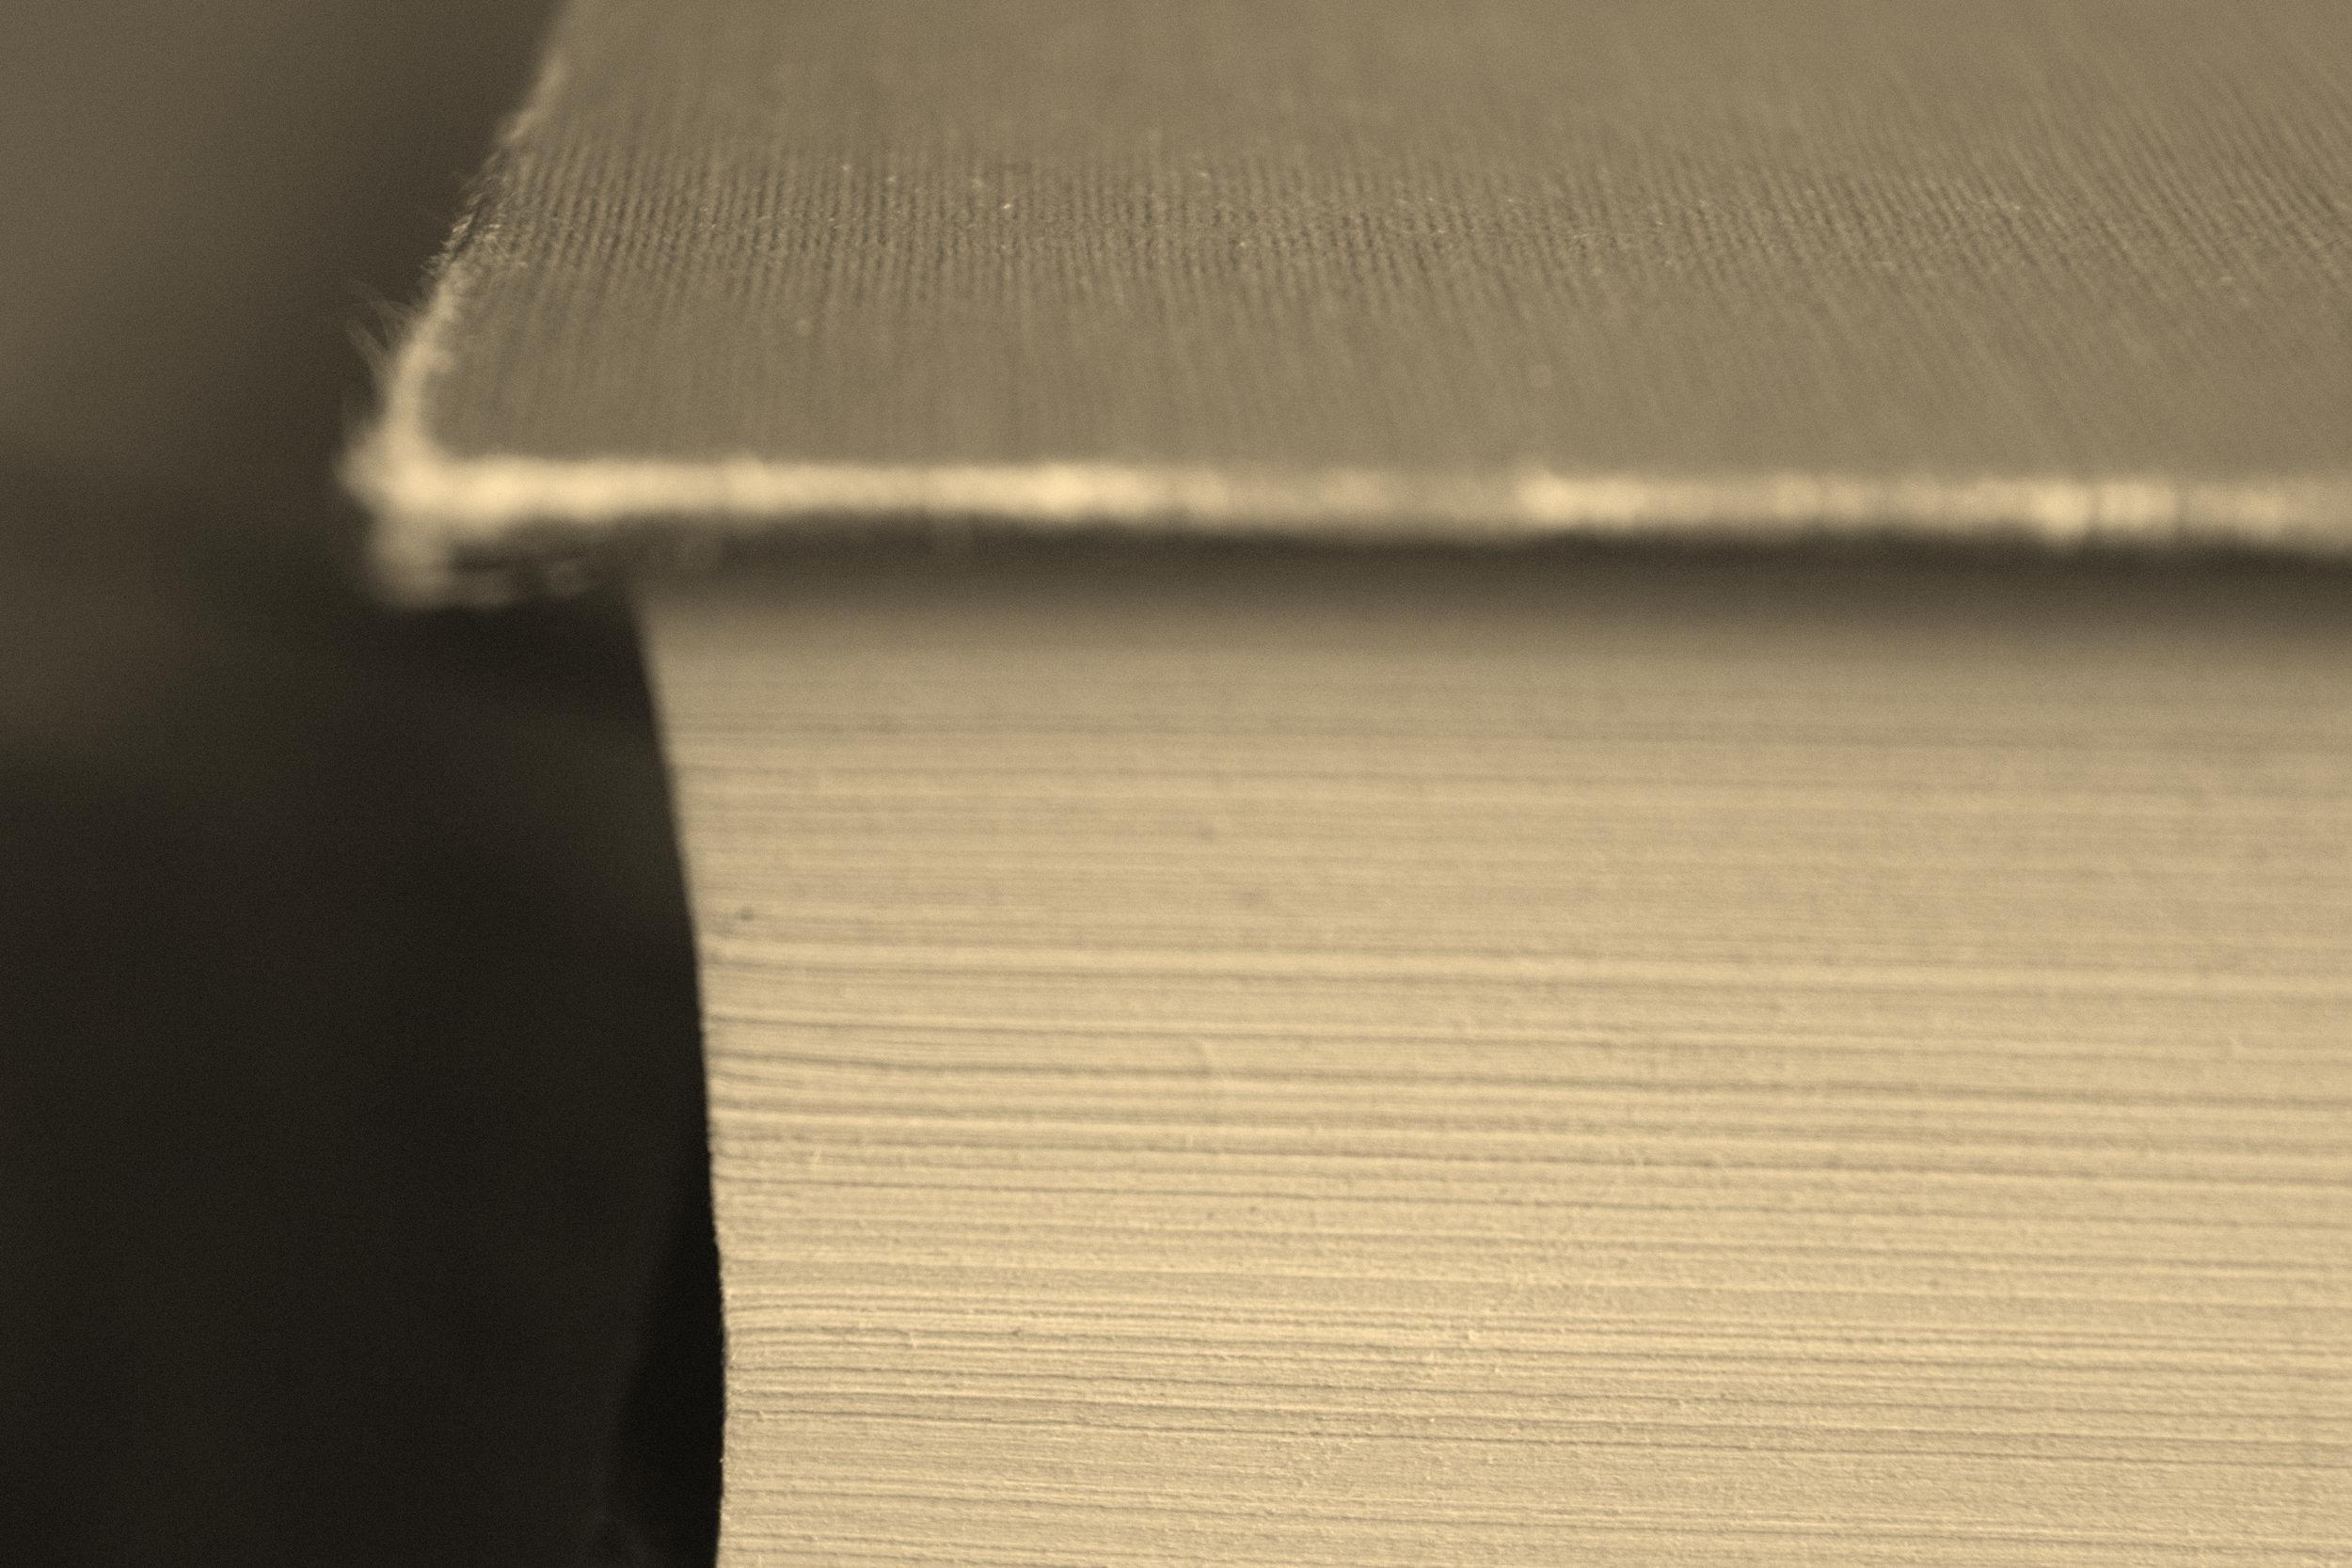 old book close up.jpg